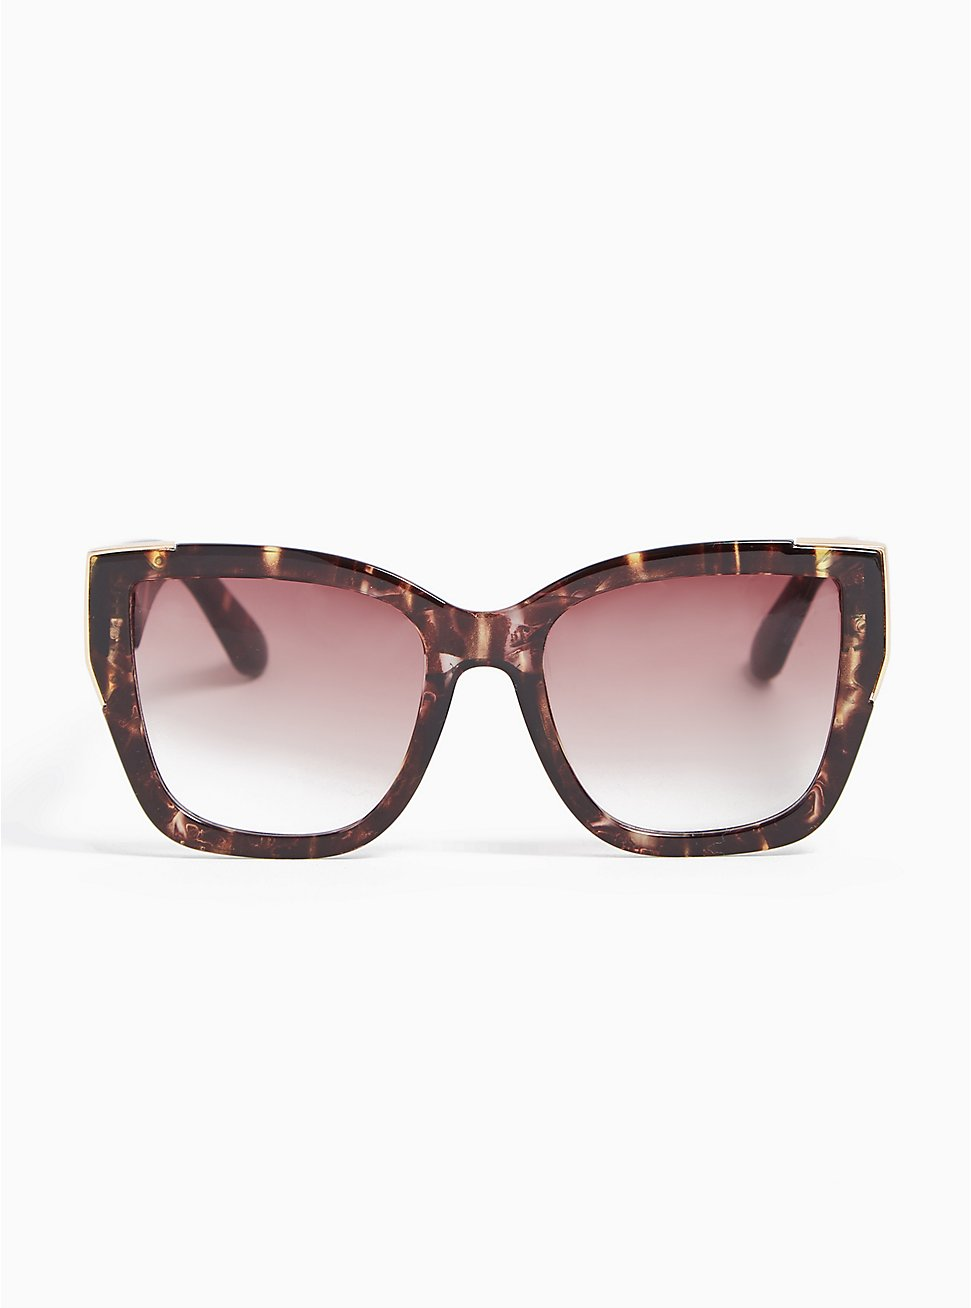 Plus Size Tortoiseshell Cat Eye Sunglasses, , hi-res